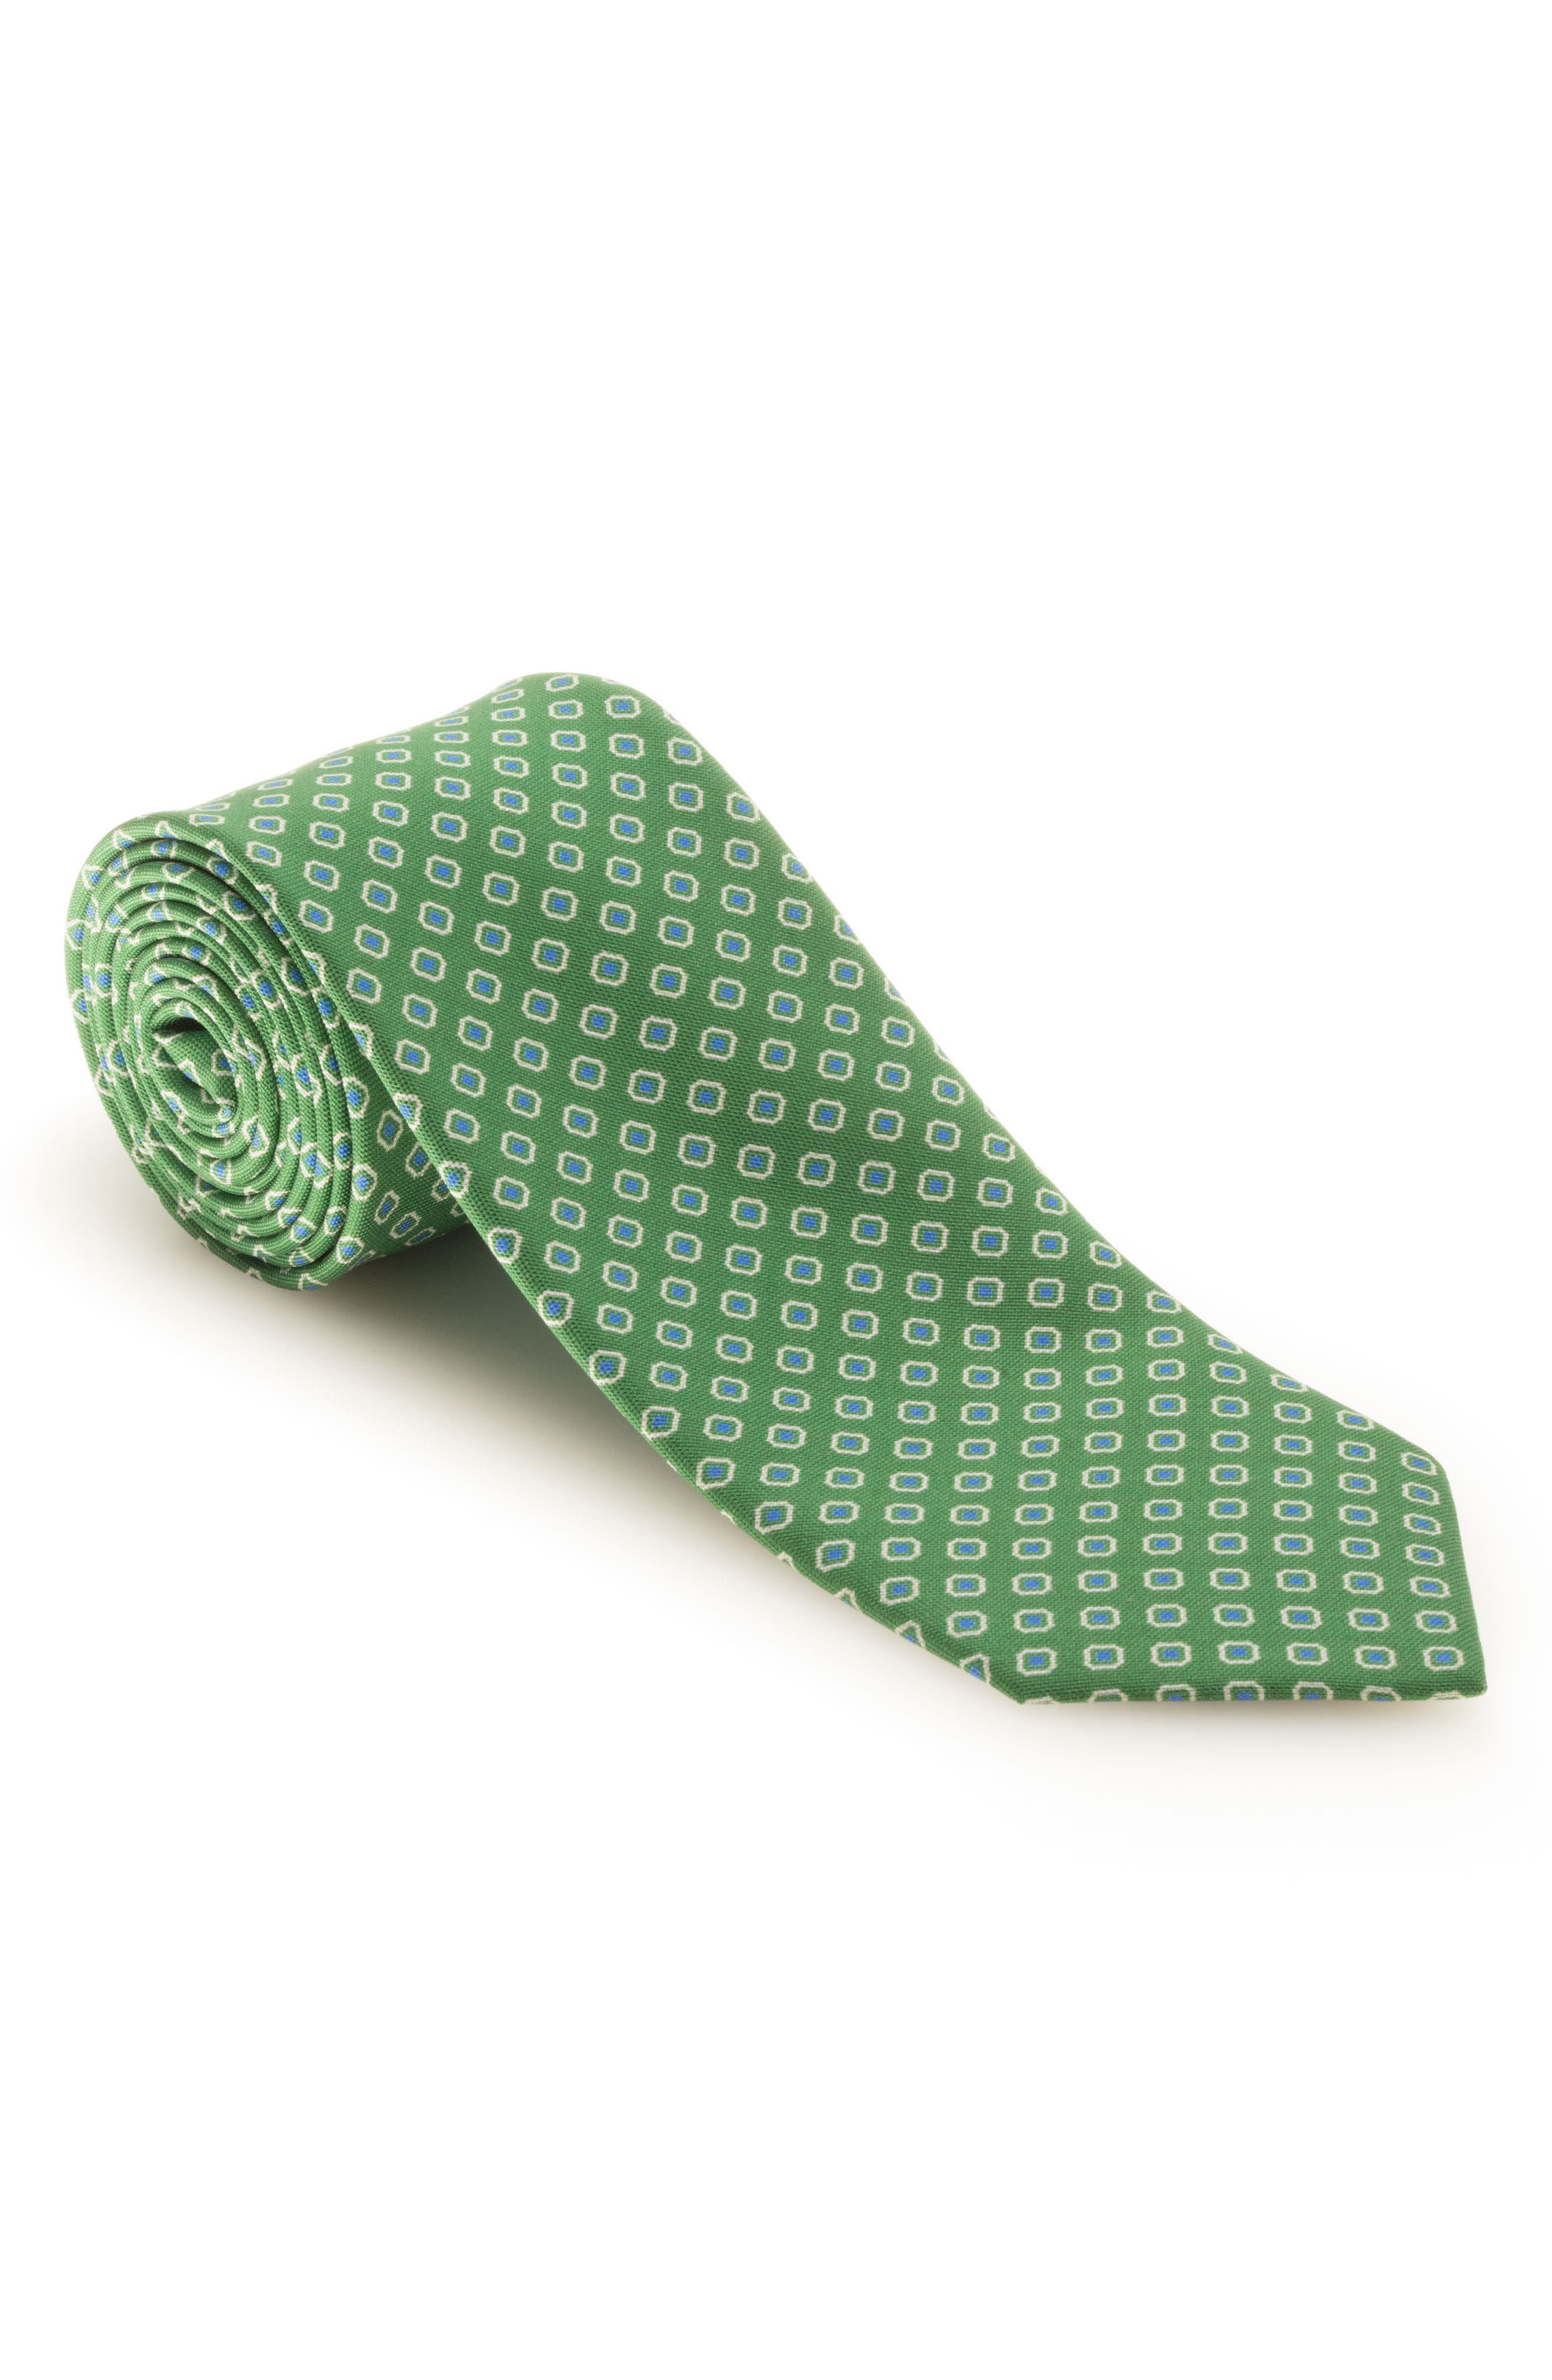 Alternate Image 1 Selected - Robert Talbott Medallion Silk Tie